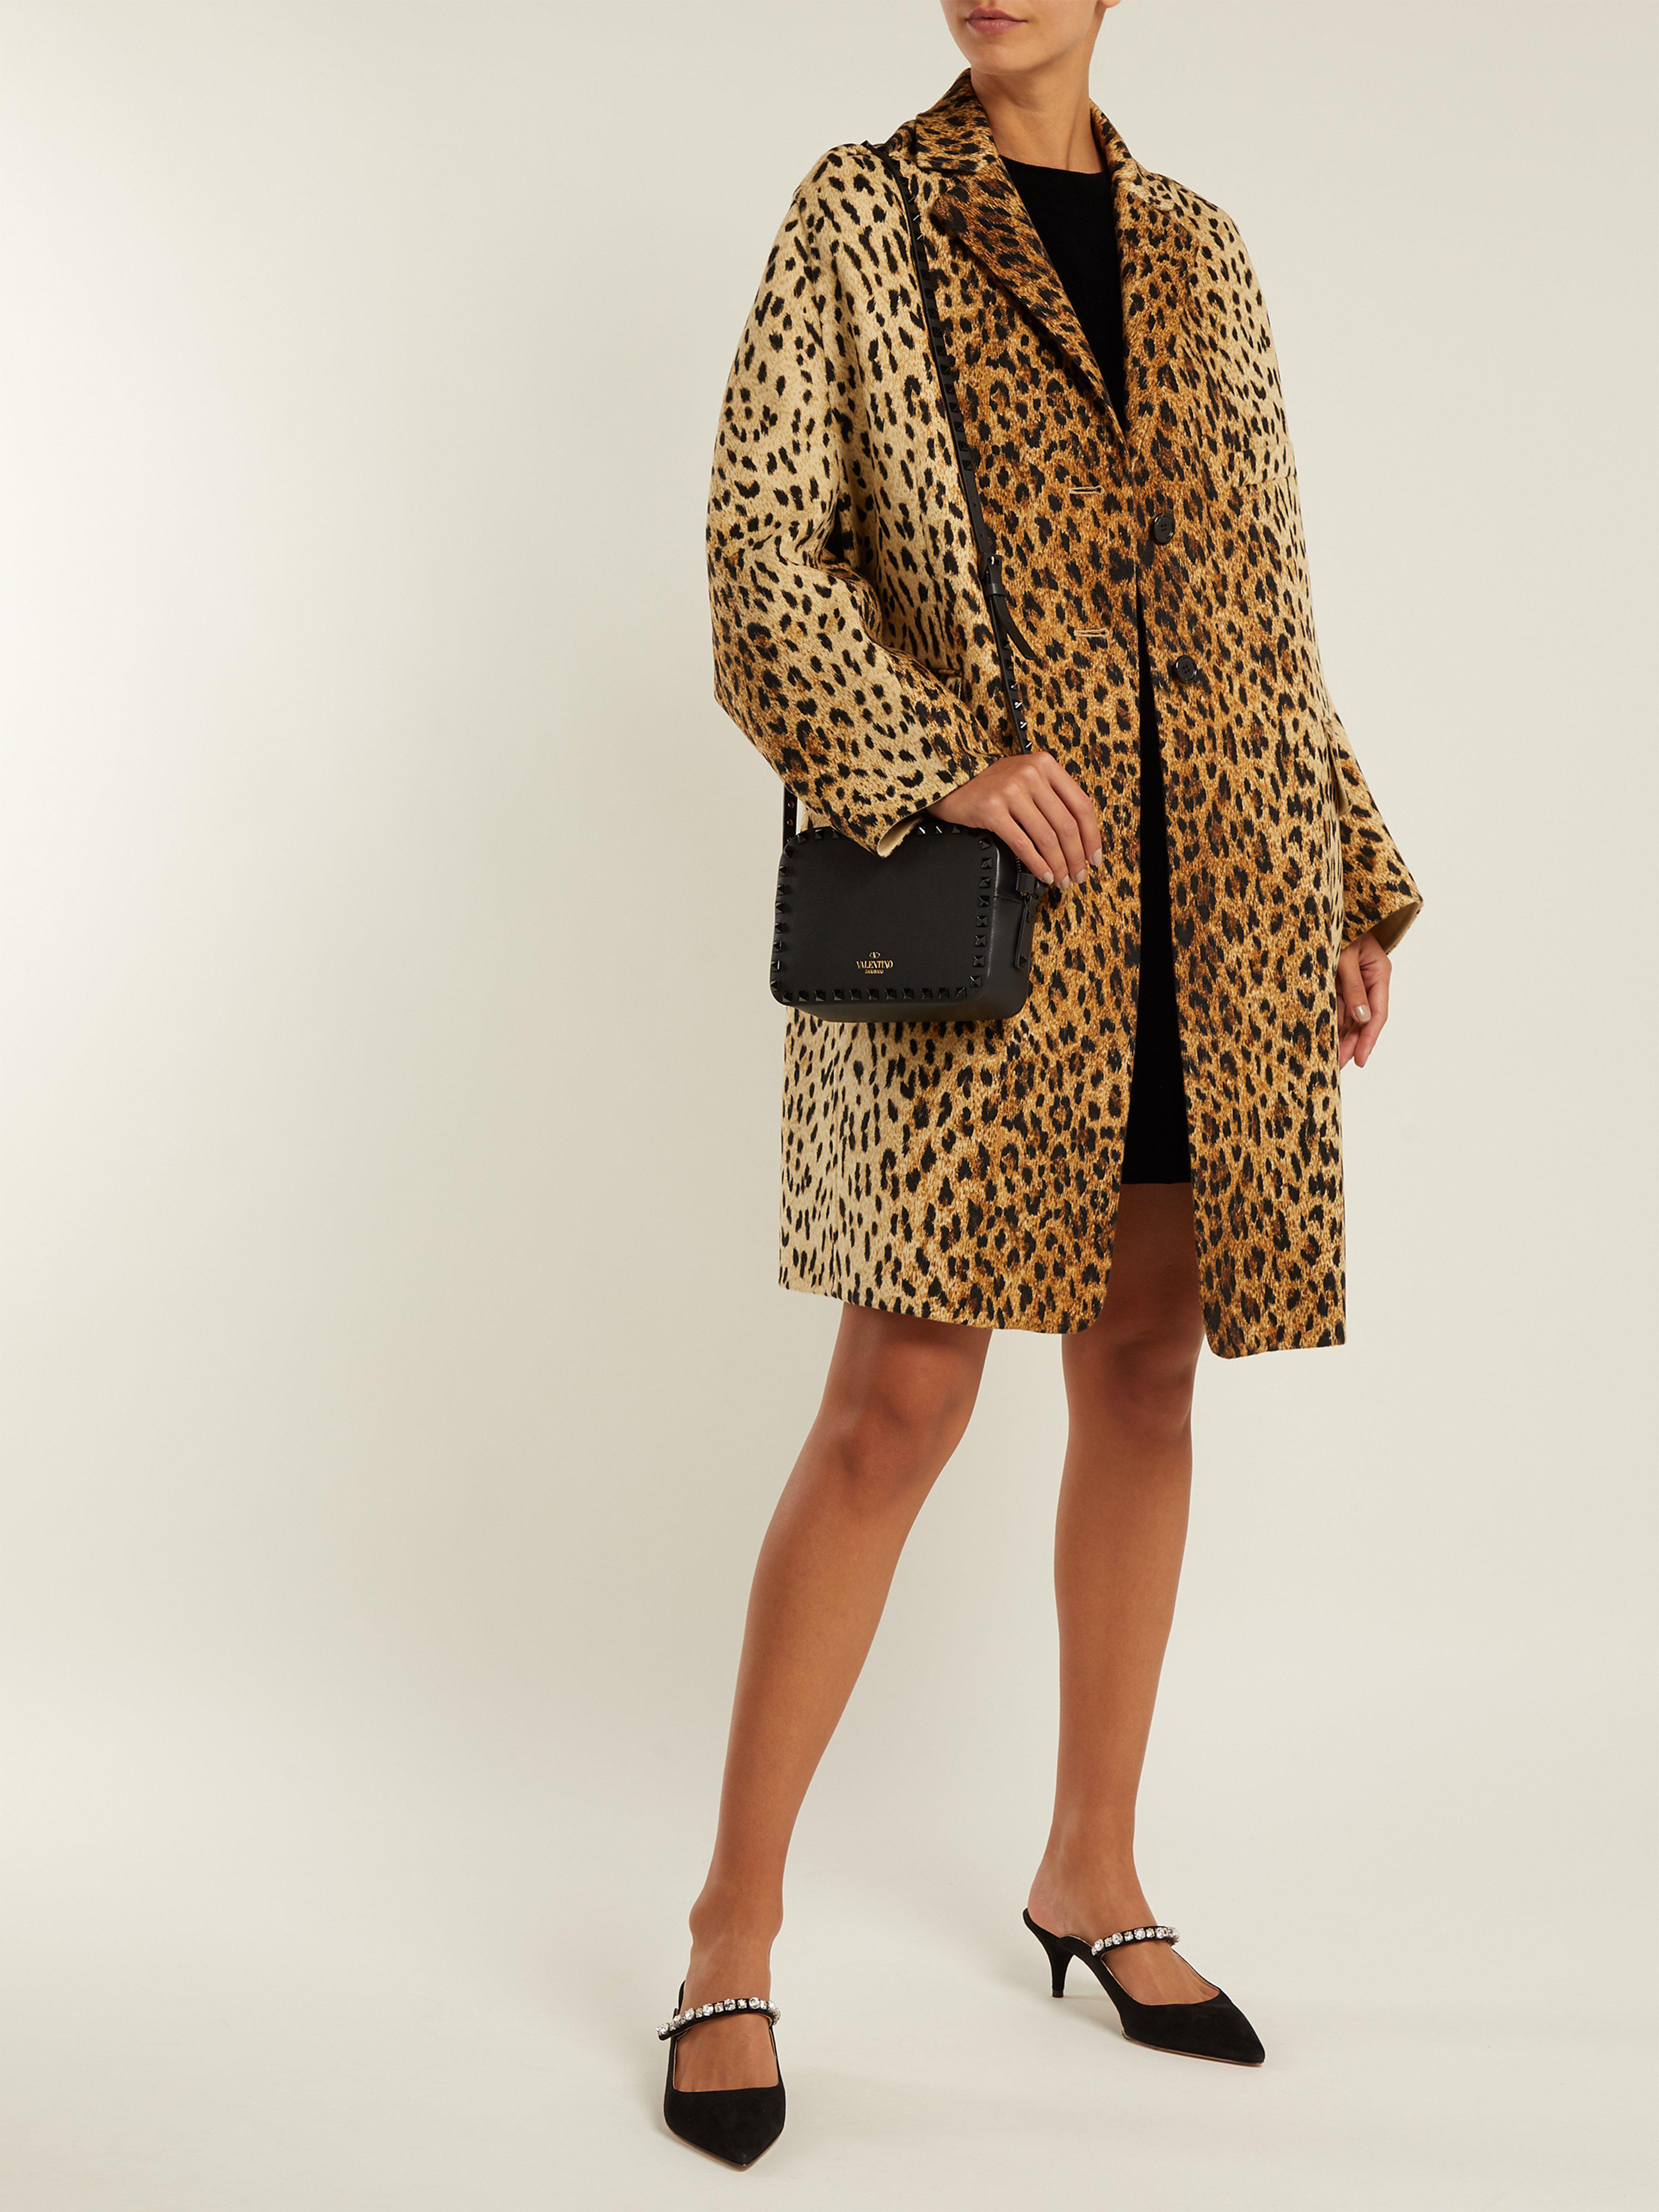 1e39d2203038 Valentino Leopard-print Wool-blend Coat in Brown - Lyst